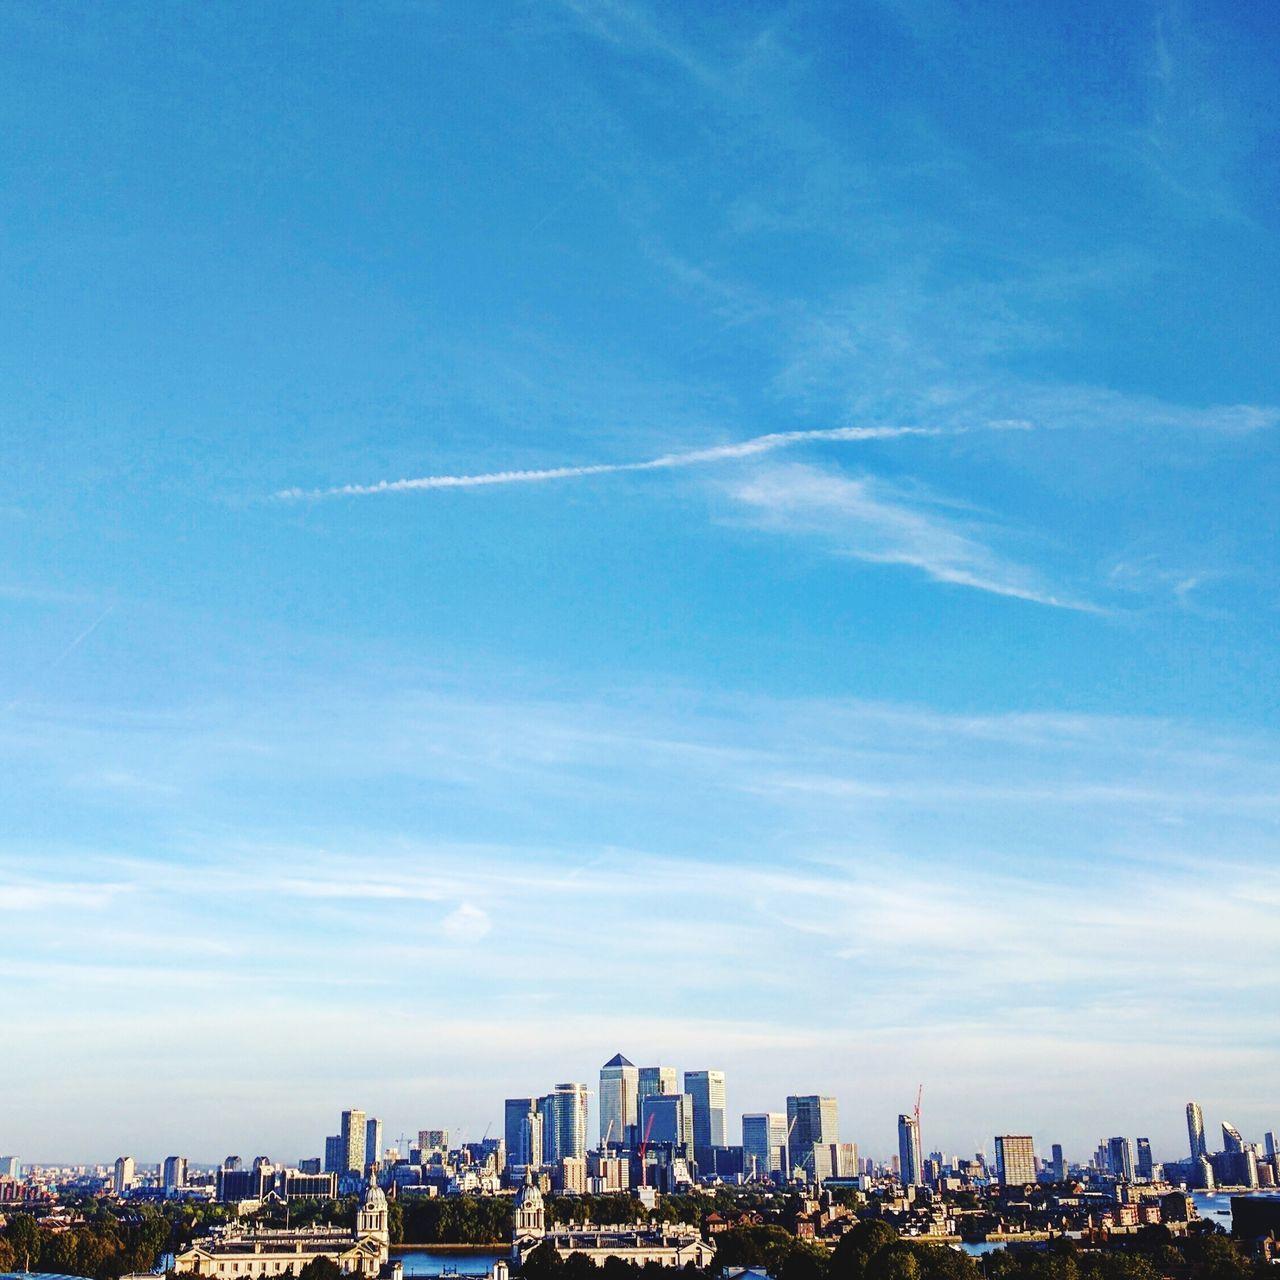 architecture, cityscape, built structure, building exterior, city, skyscraper, sky, blue, cloud - sky, travel destinations, urban skyline, modern, outdoors, day, no people